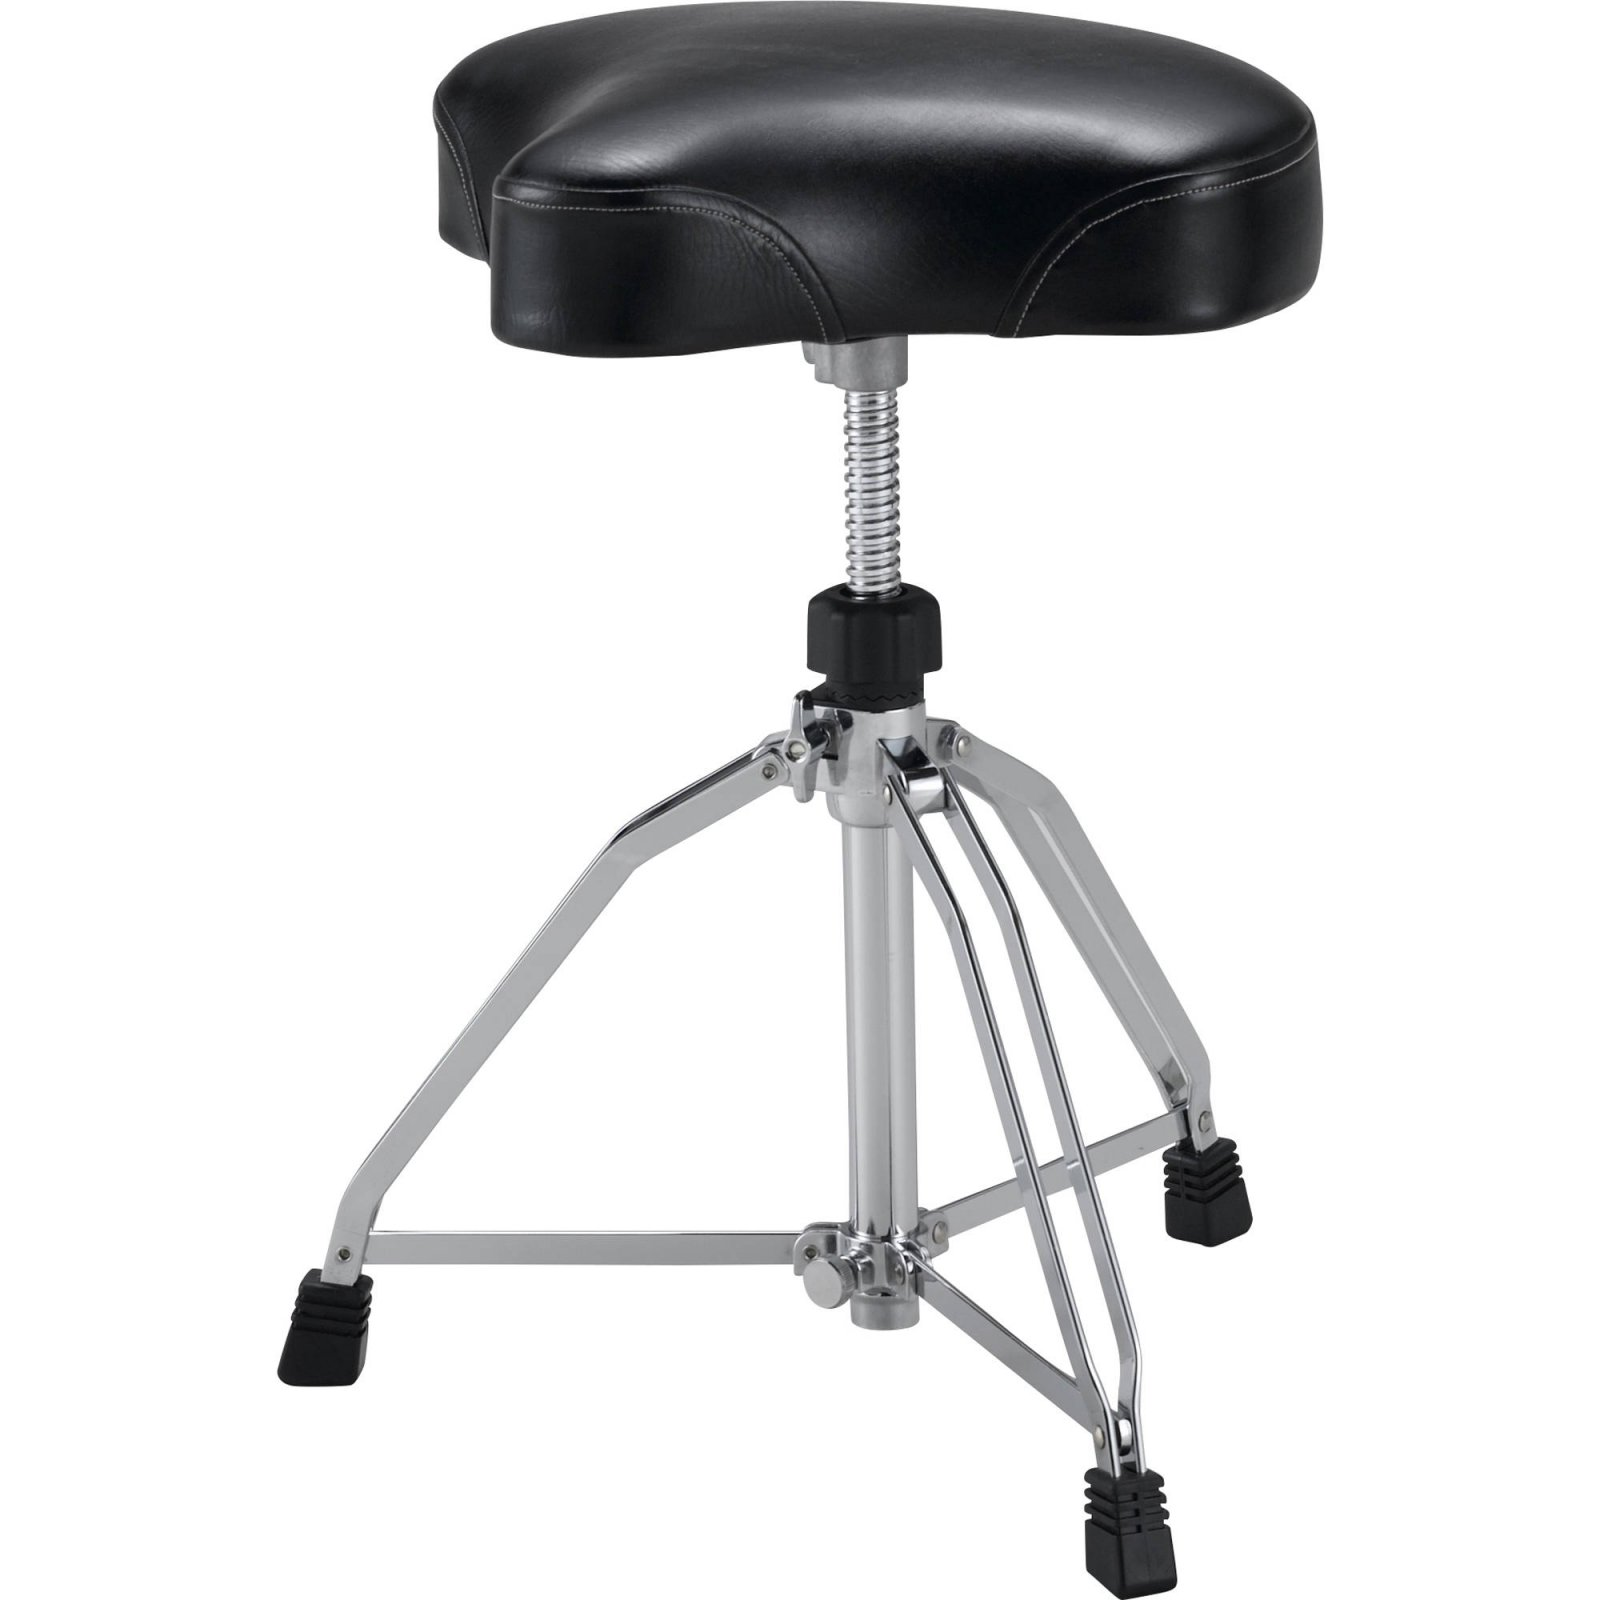 TAMA Roadpro Series HT75WN Drum Throne